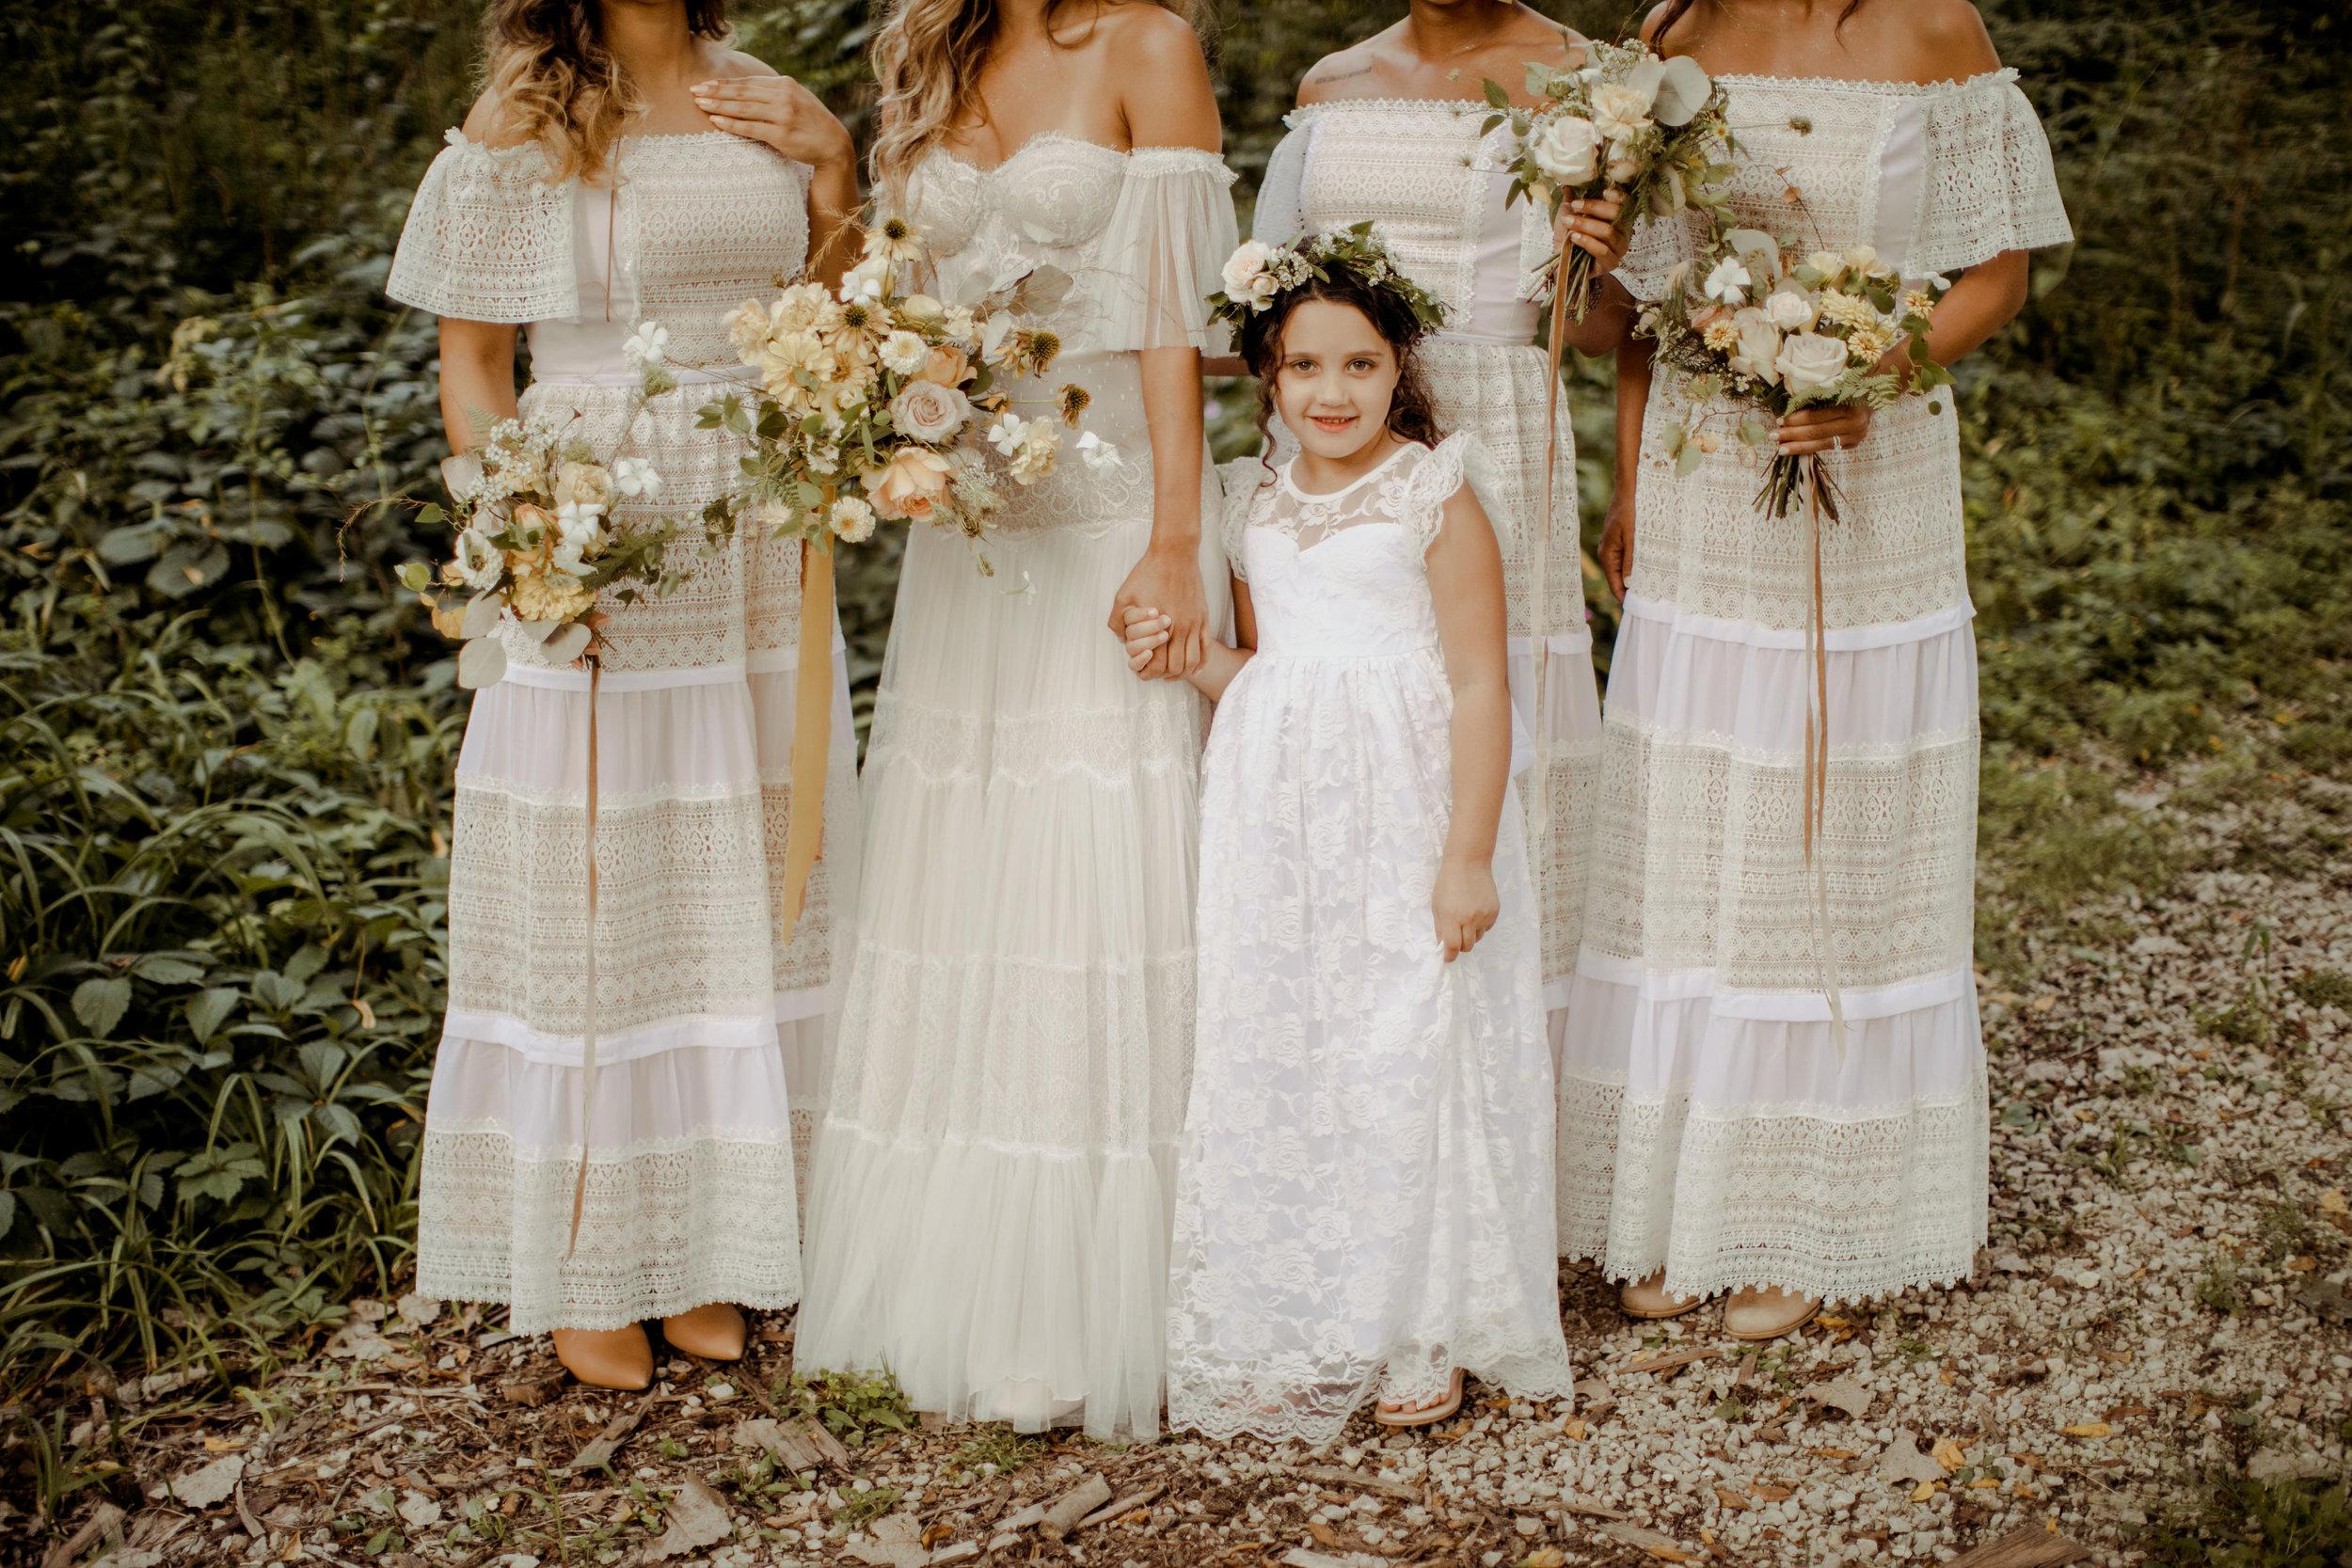 milwaukee-wedding-photographer-camp-wandawega-wedding-326.jpg